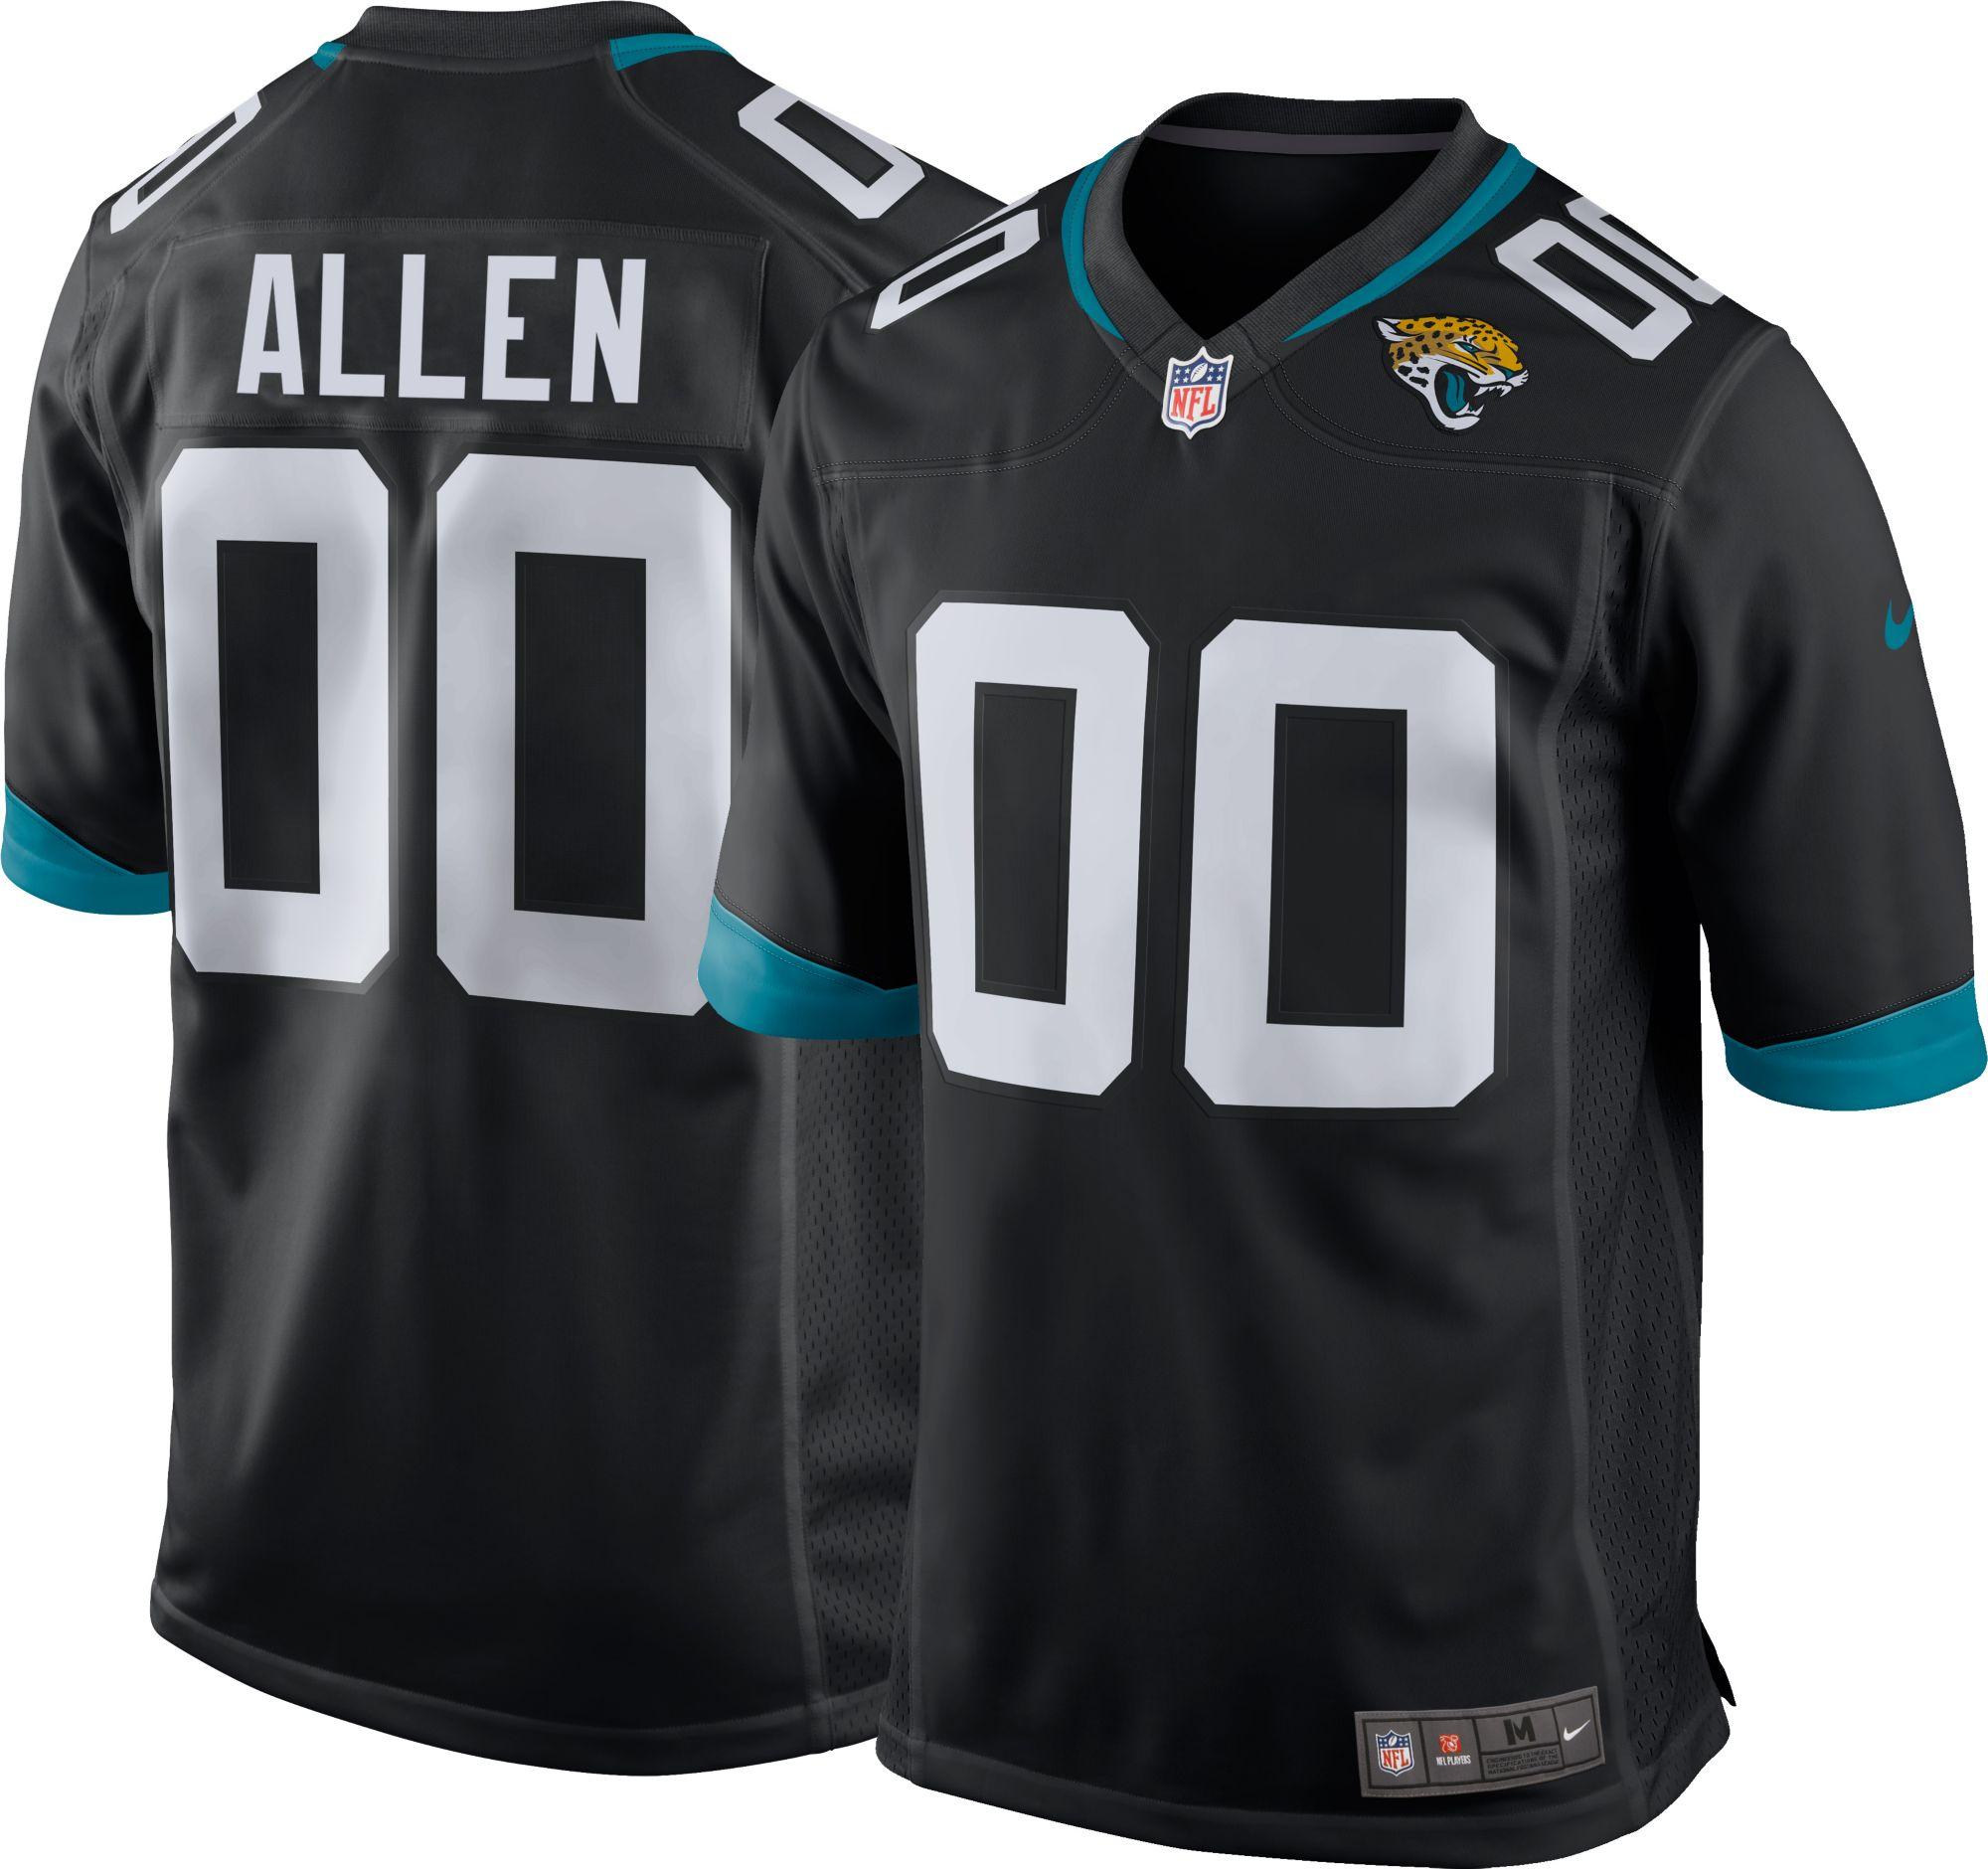 size 40 78986 c197b Josh Allen #41 Nike Men's Jacksonville Jaguars Home Game ...